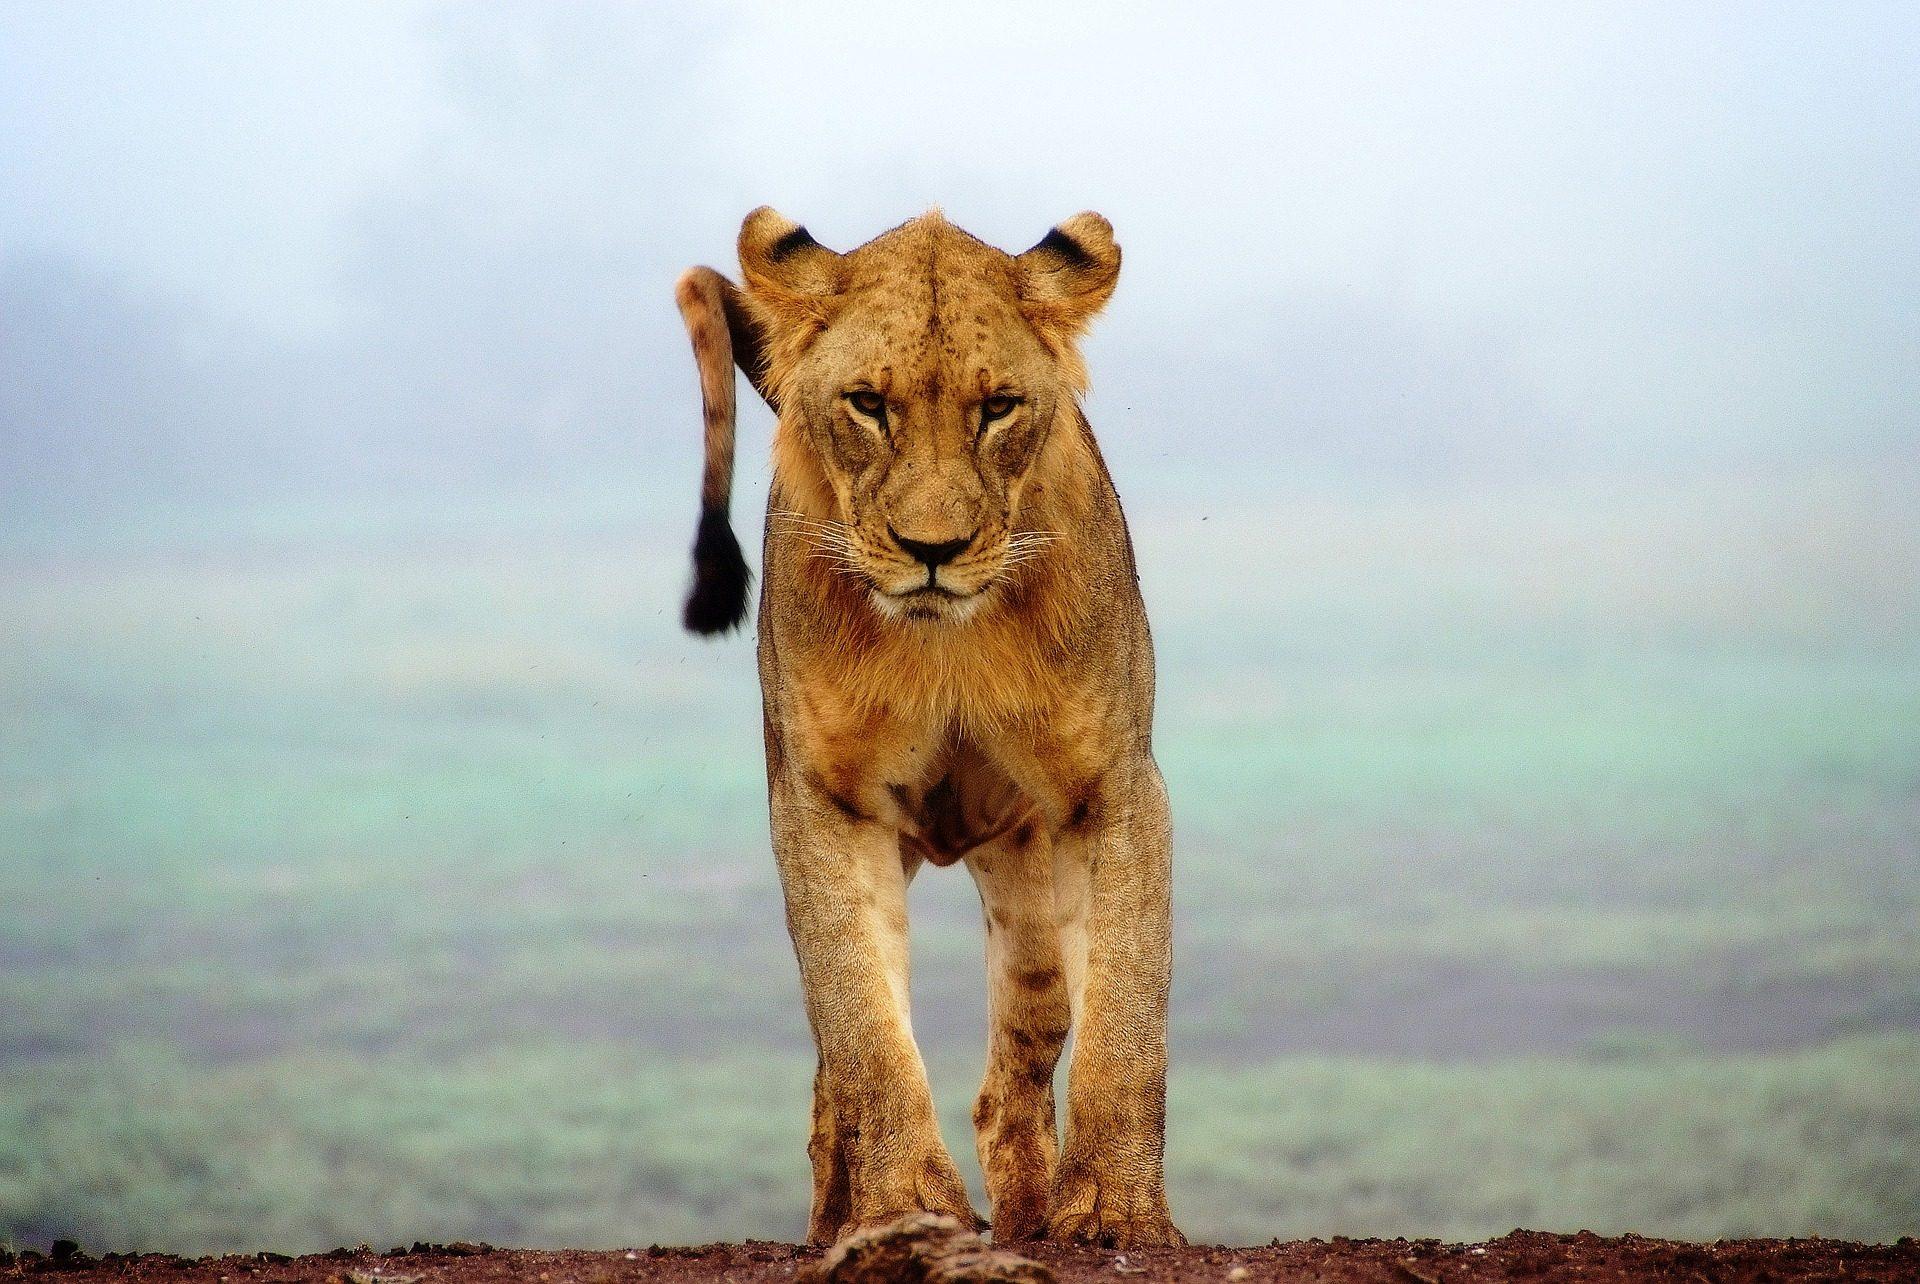 Leon, cría, felino, Predador, Selvagem - Papéis de parede HD - Professor-falken.com